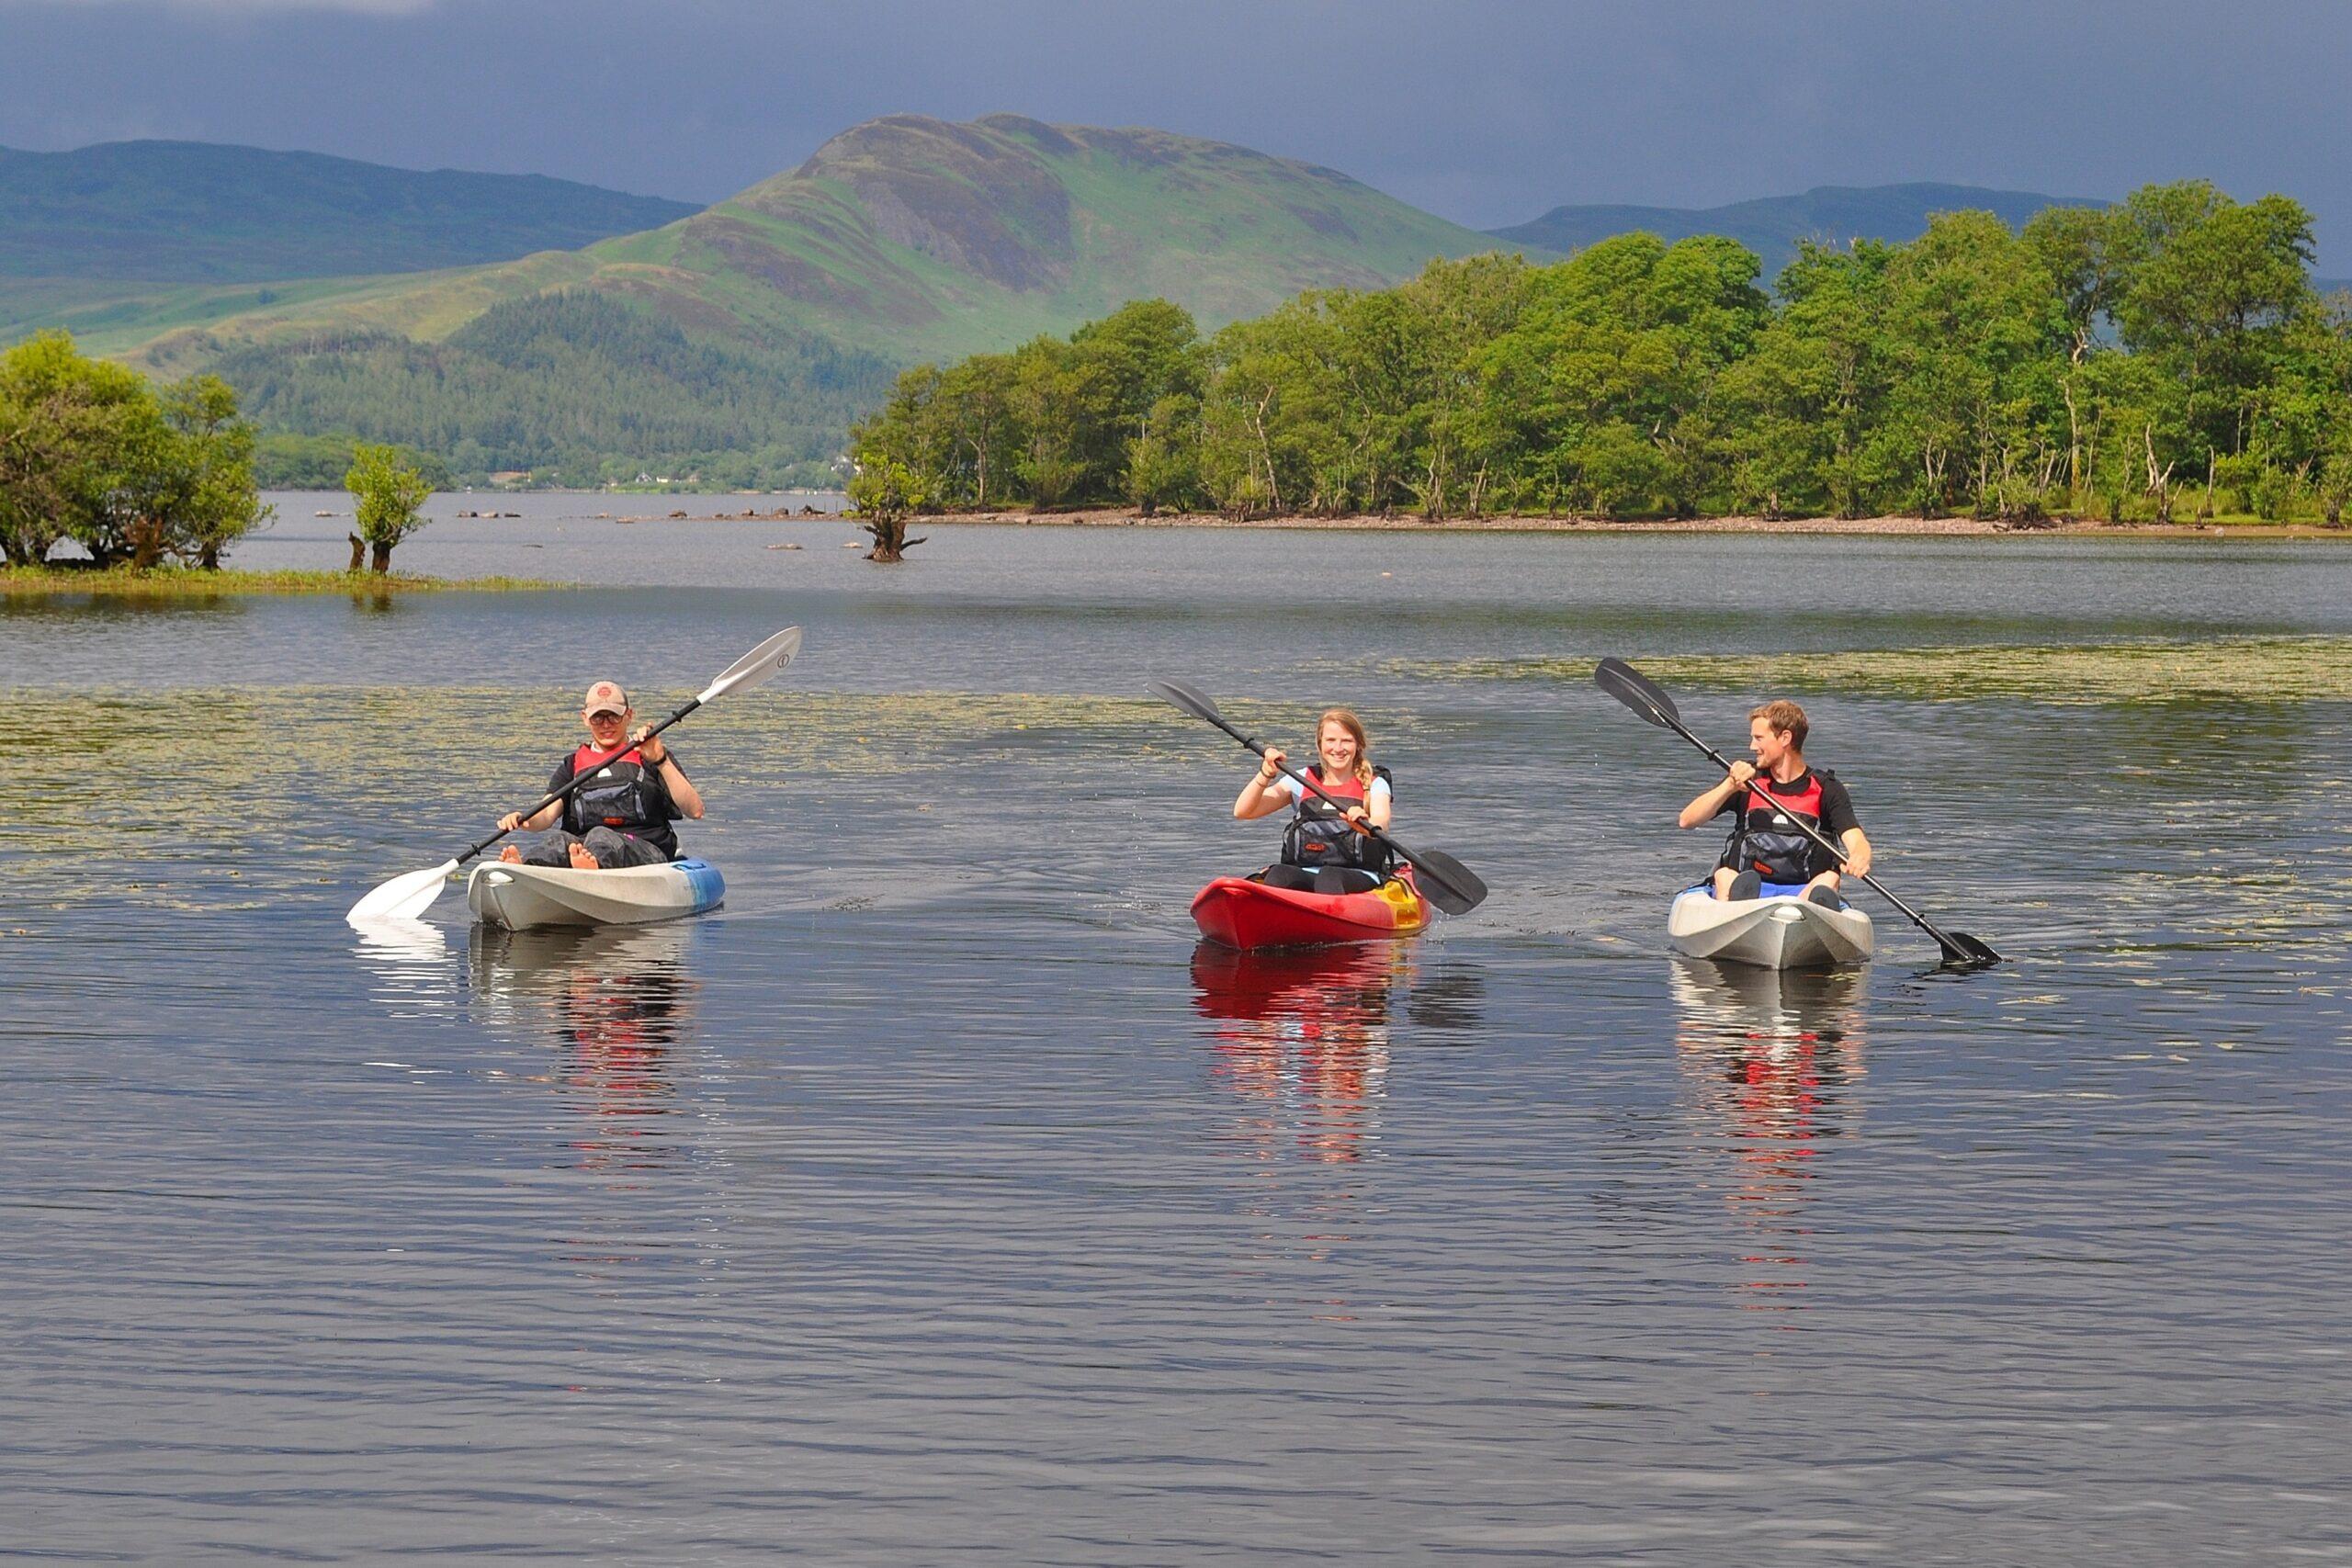 Three kayakers on Loch Lomond near Portnellan Farm